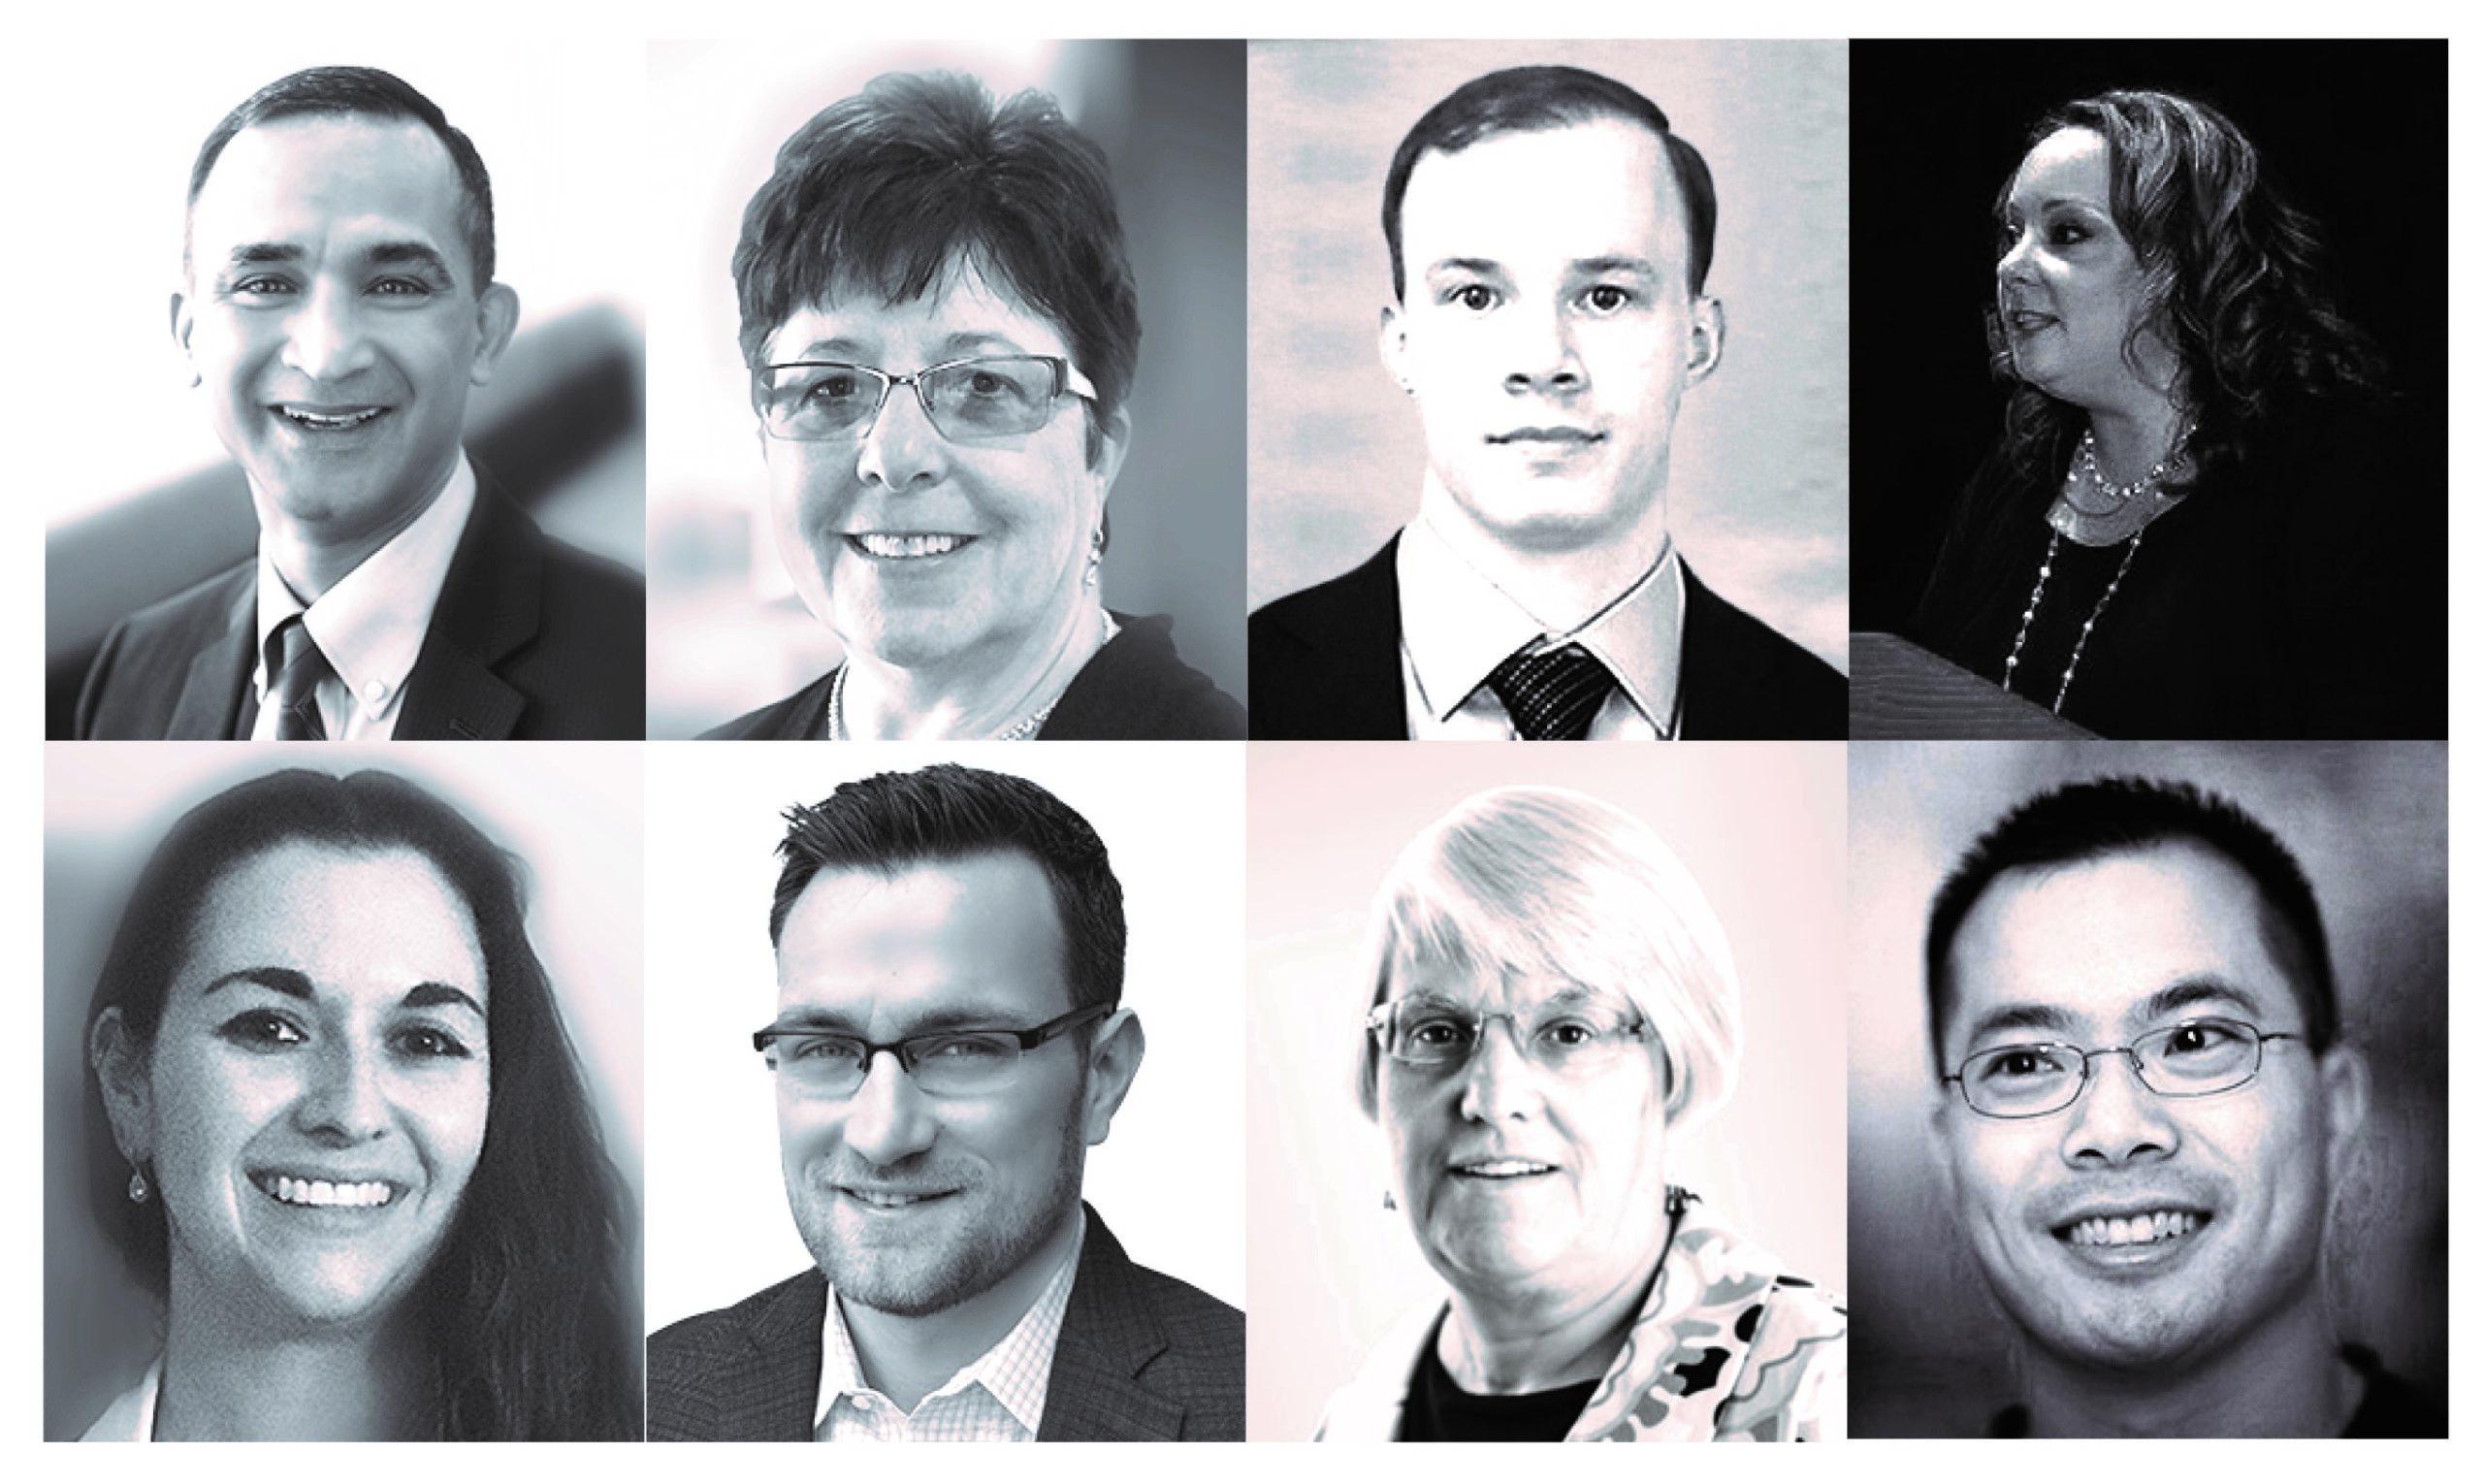 7c Board of Directors 11-22